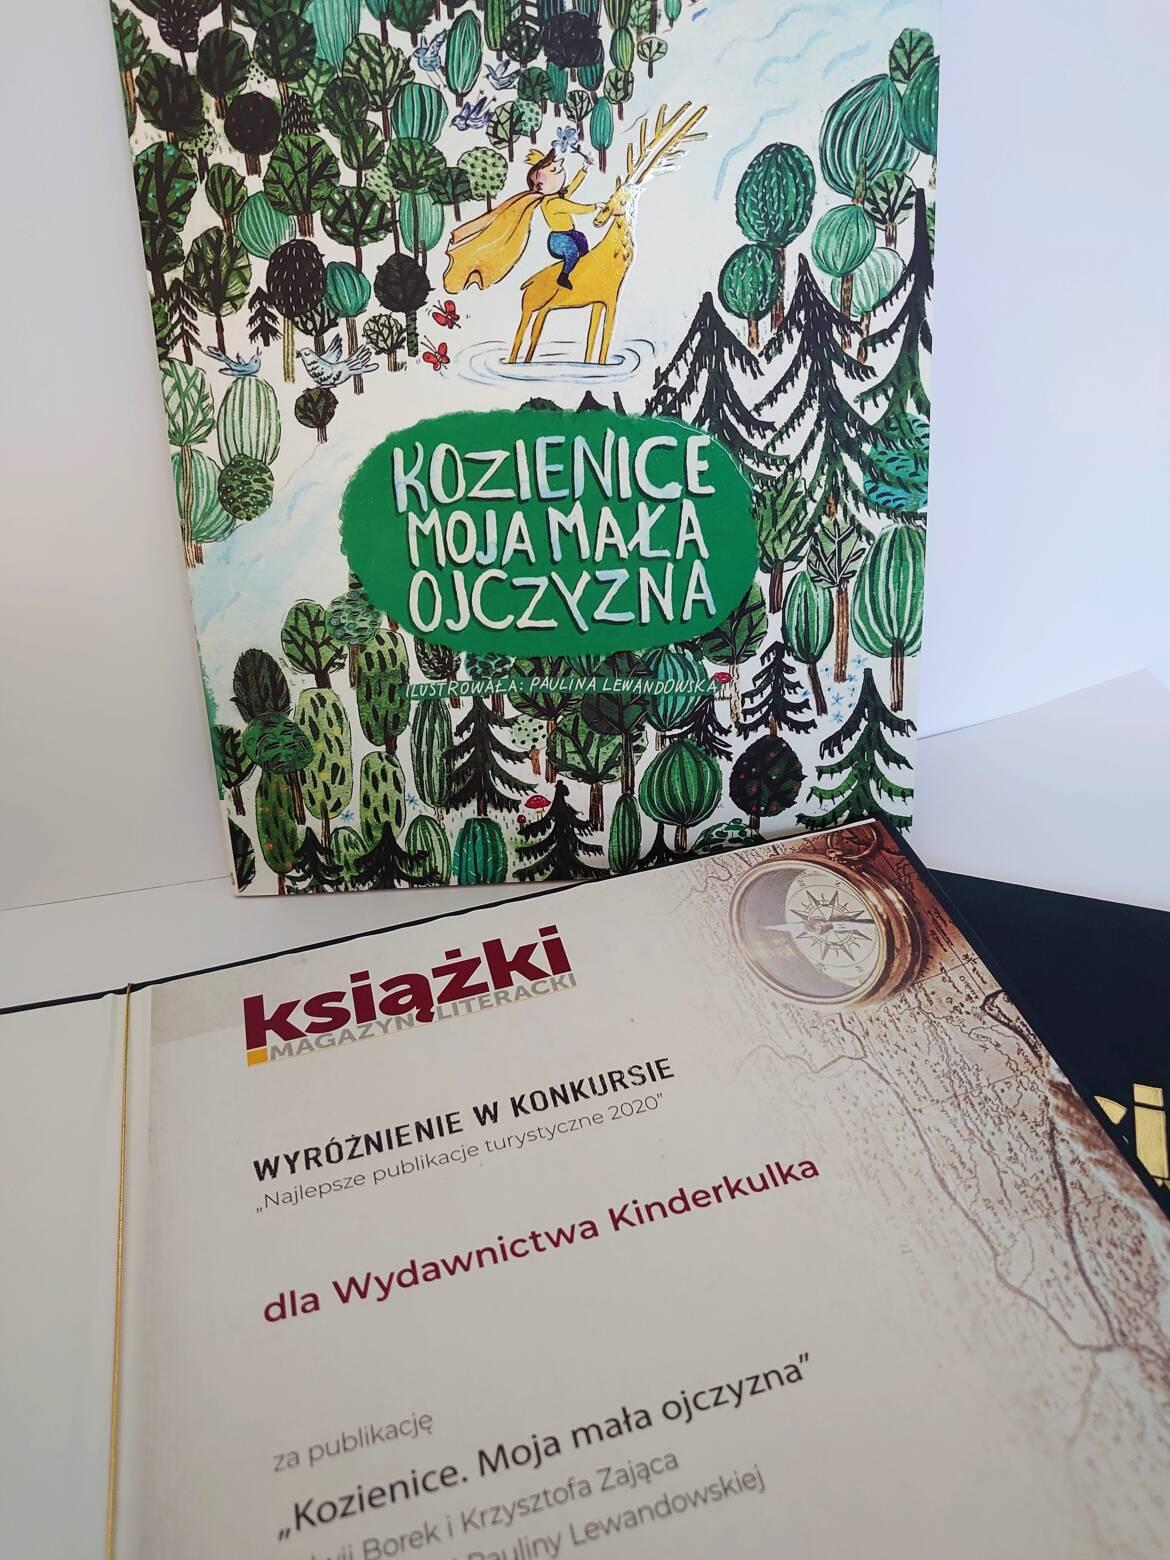 Kinderkulka_Kozienice_moja_mala_ojczyzna_5.jpg